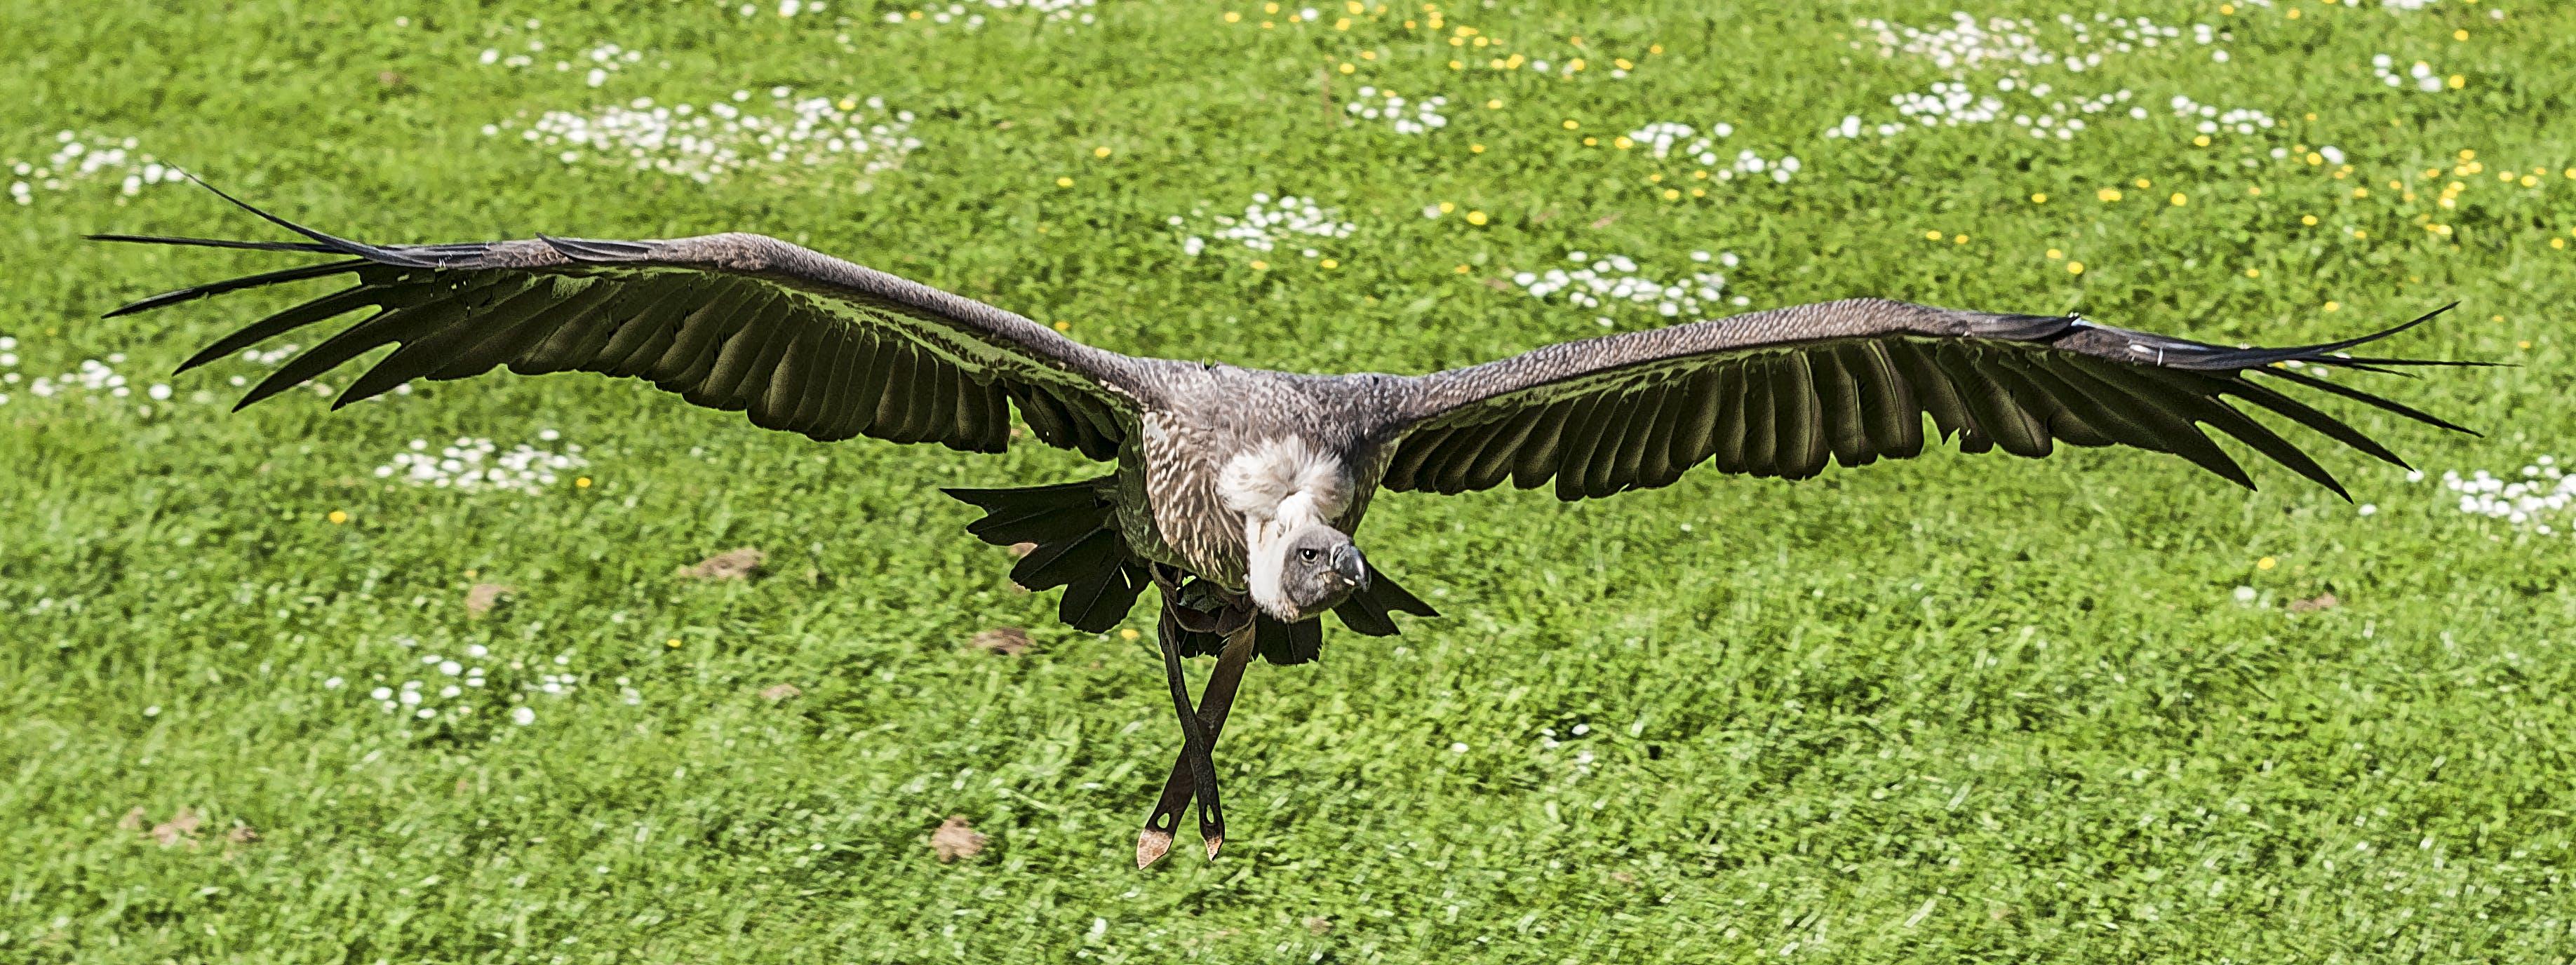 alam, binatang, burung bangkai, burung pemangsa